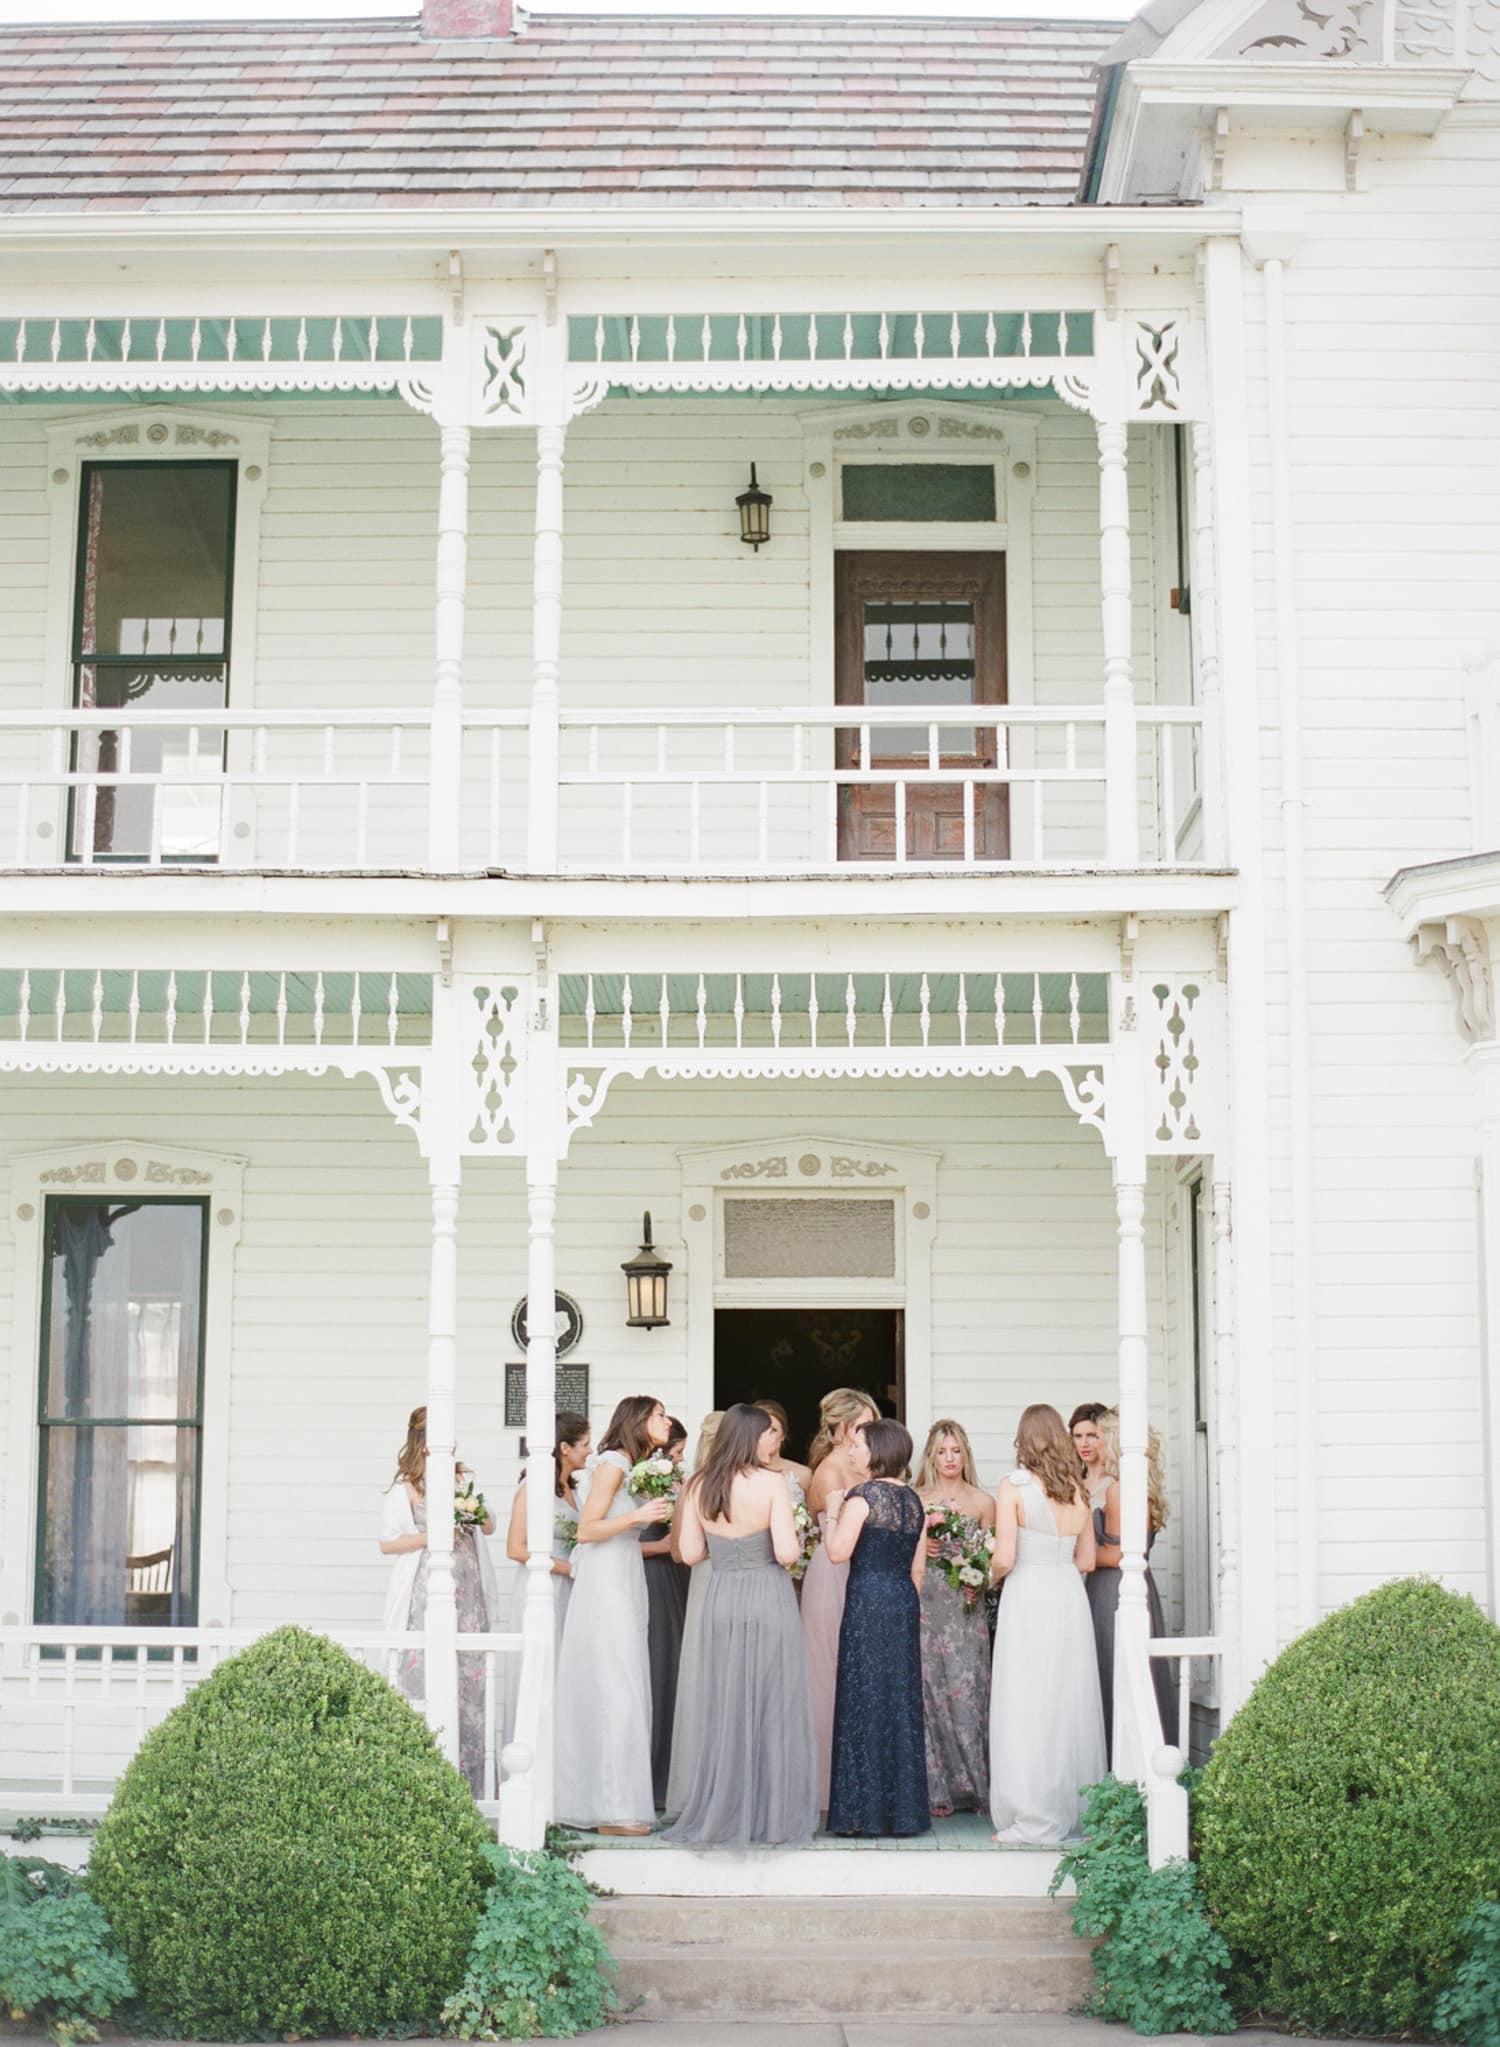 barr-mansion-wedding-6.jpg